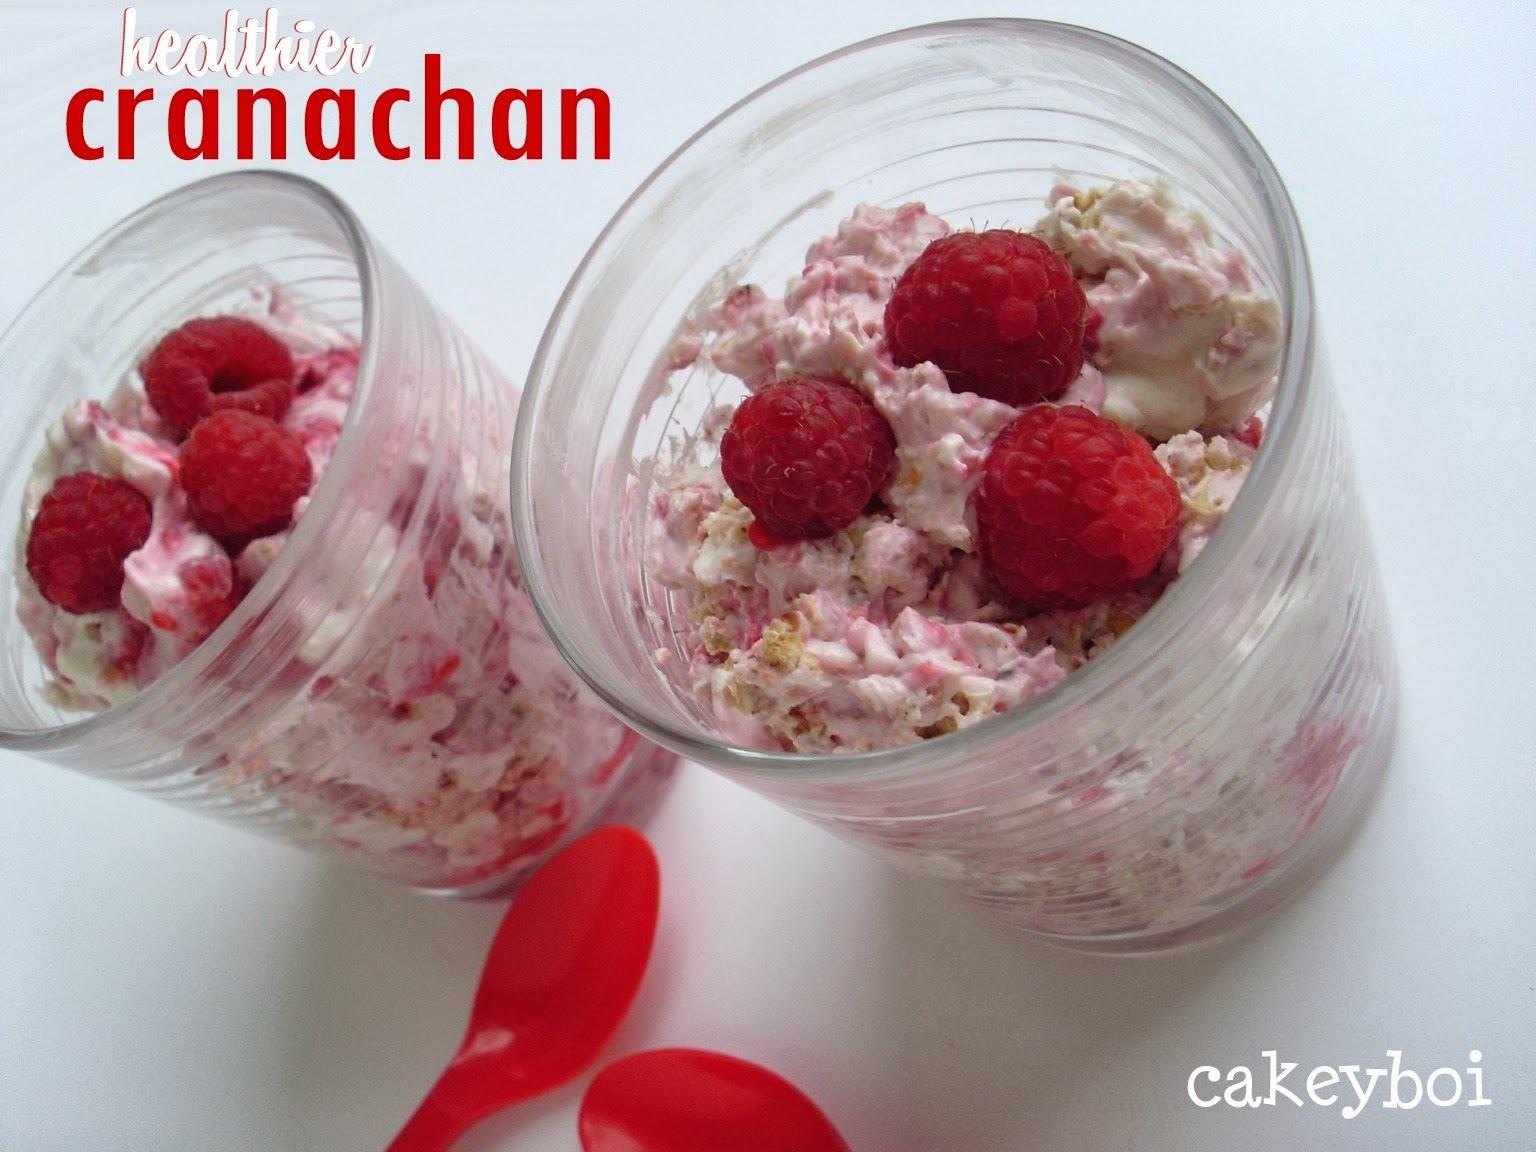 cranachan